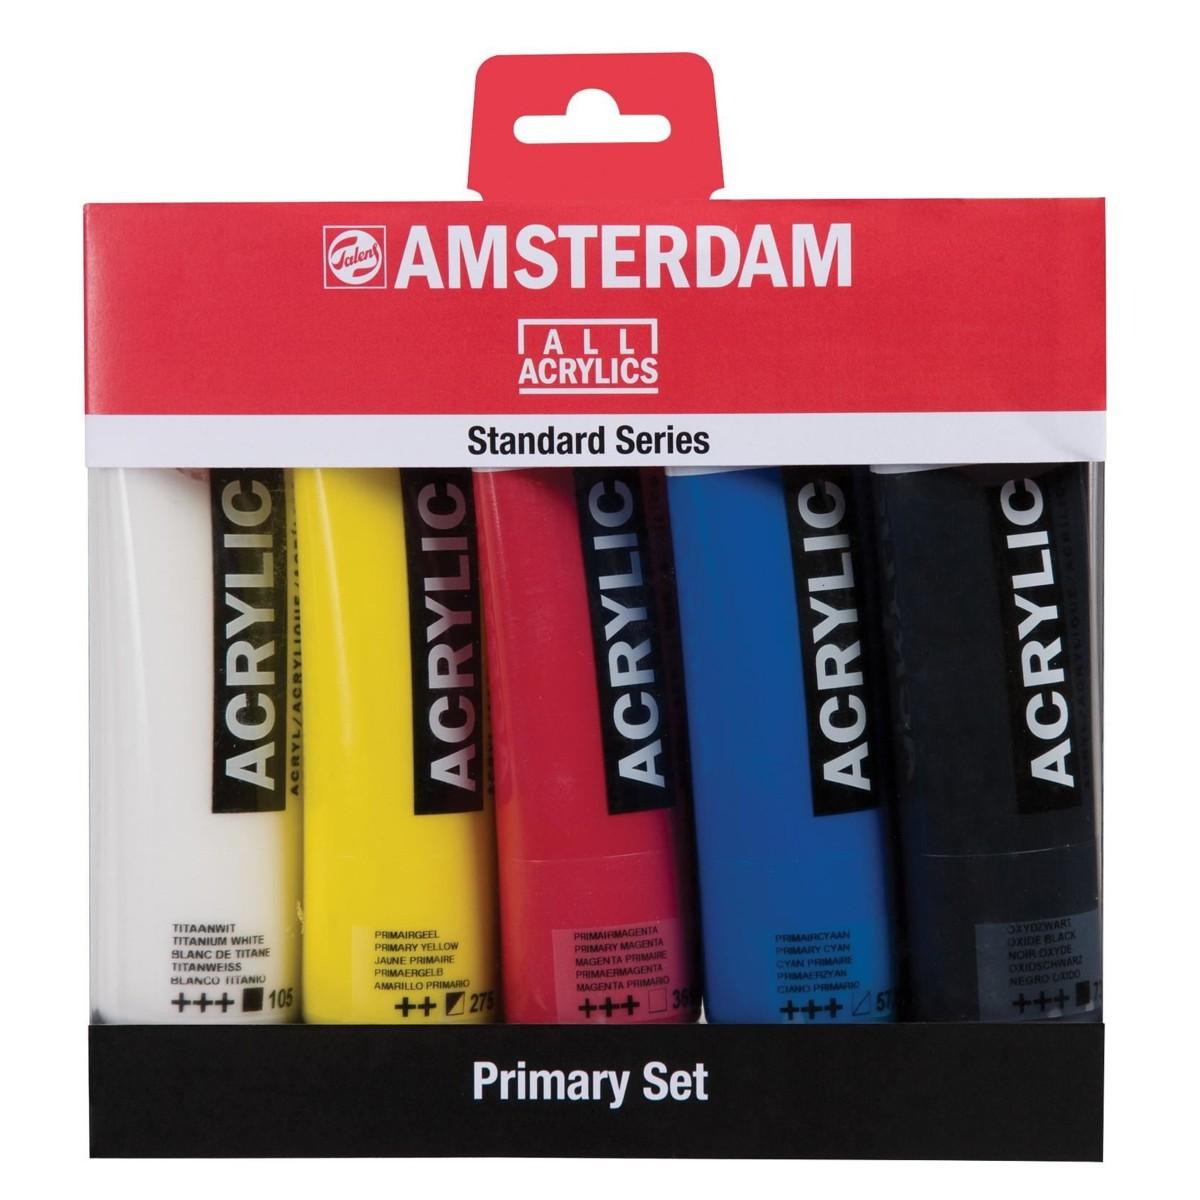 Amsterdam, akrylmaling, primary set, 120 ml, 5 stk